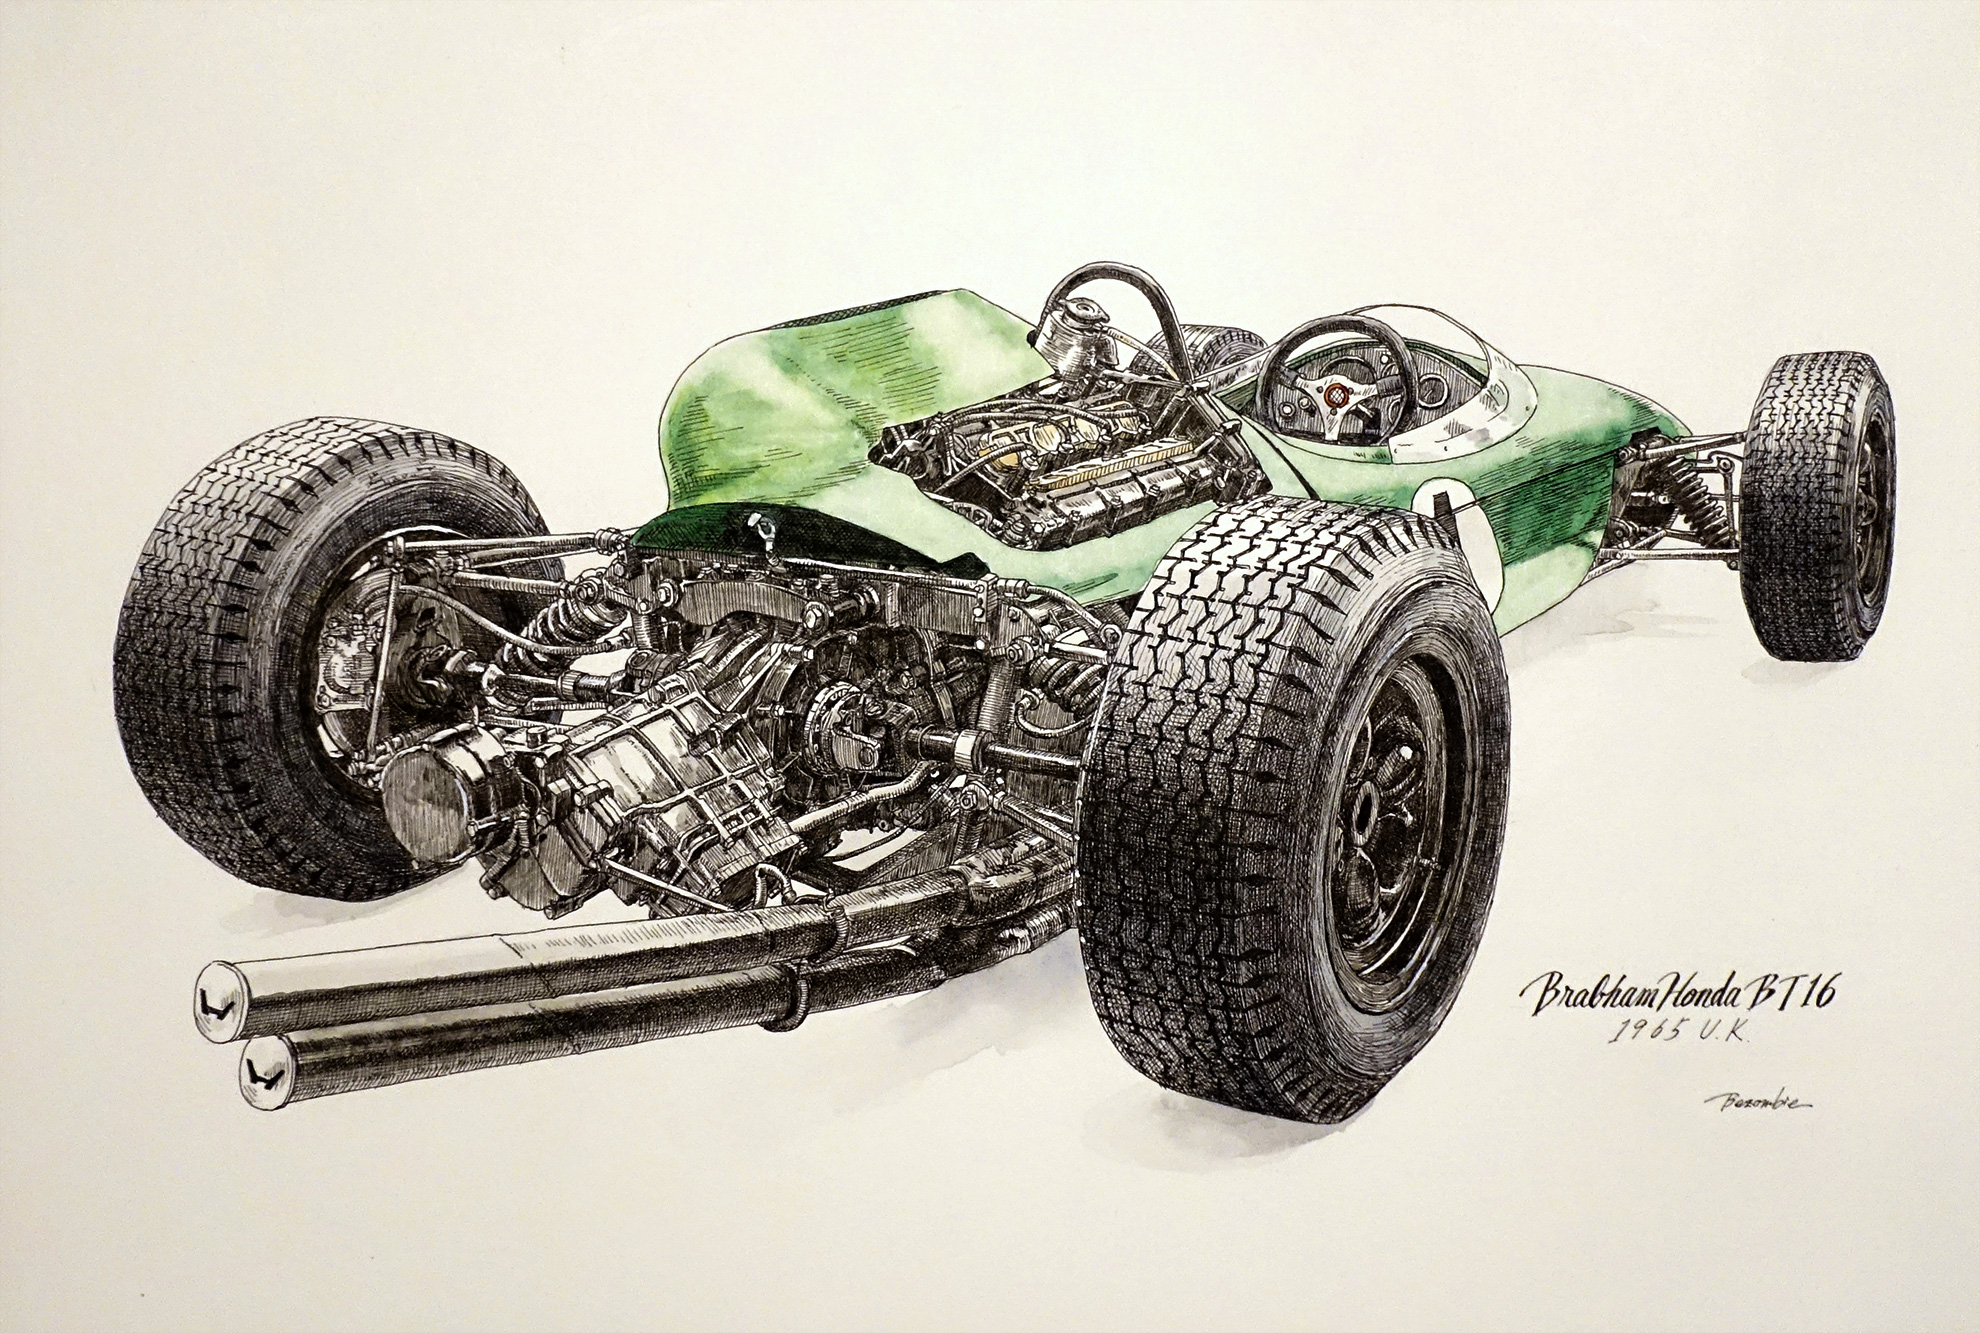 Brabham Honda BT16